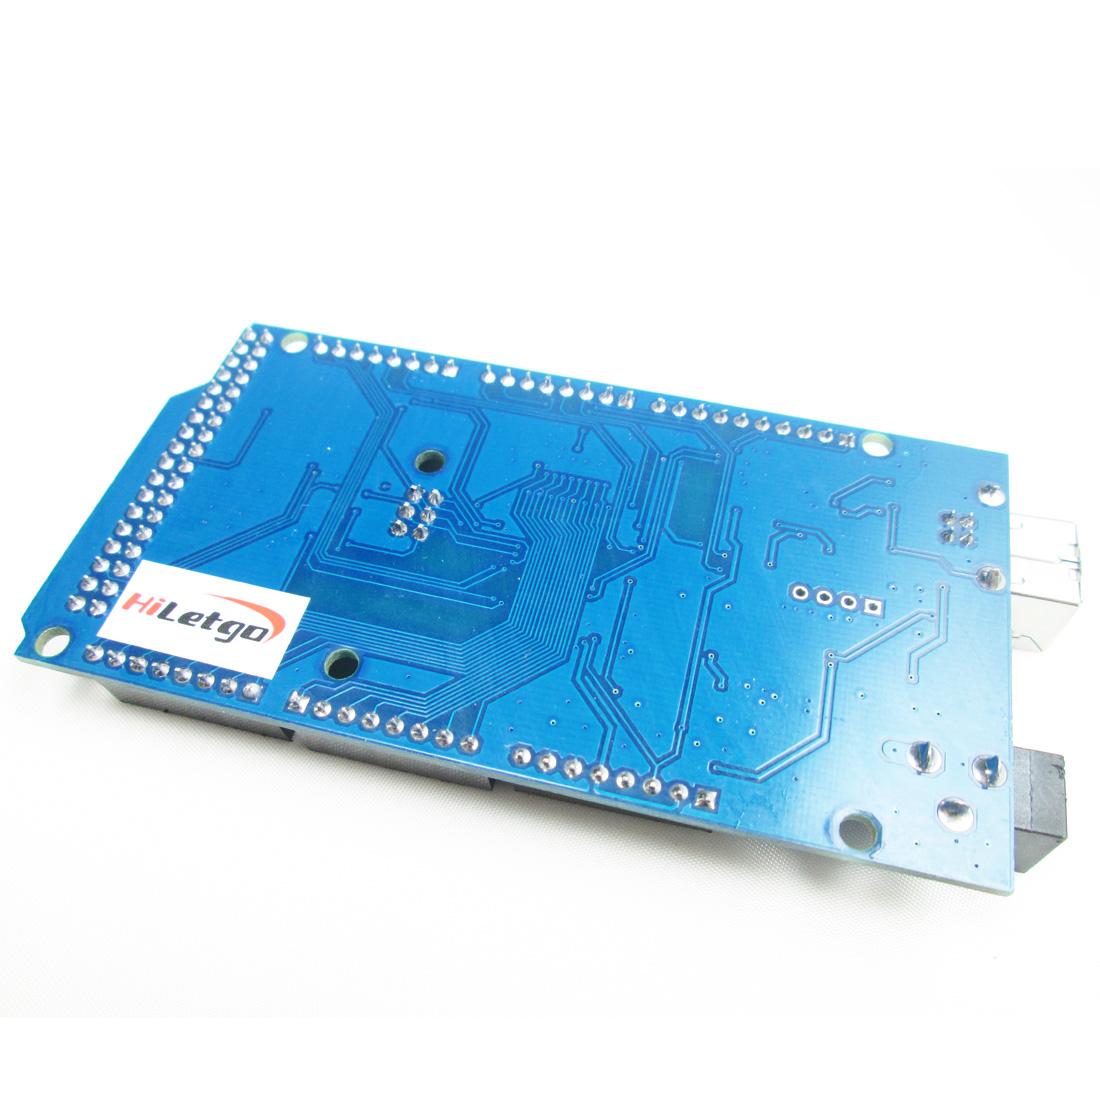 Mega2560 R3 ATMEGA16U2 CH340 Microcontroller Board Development Board